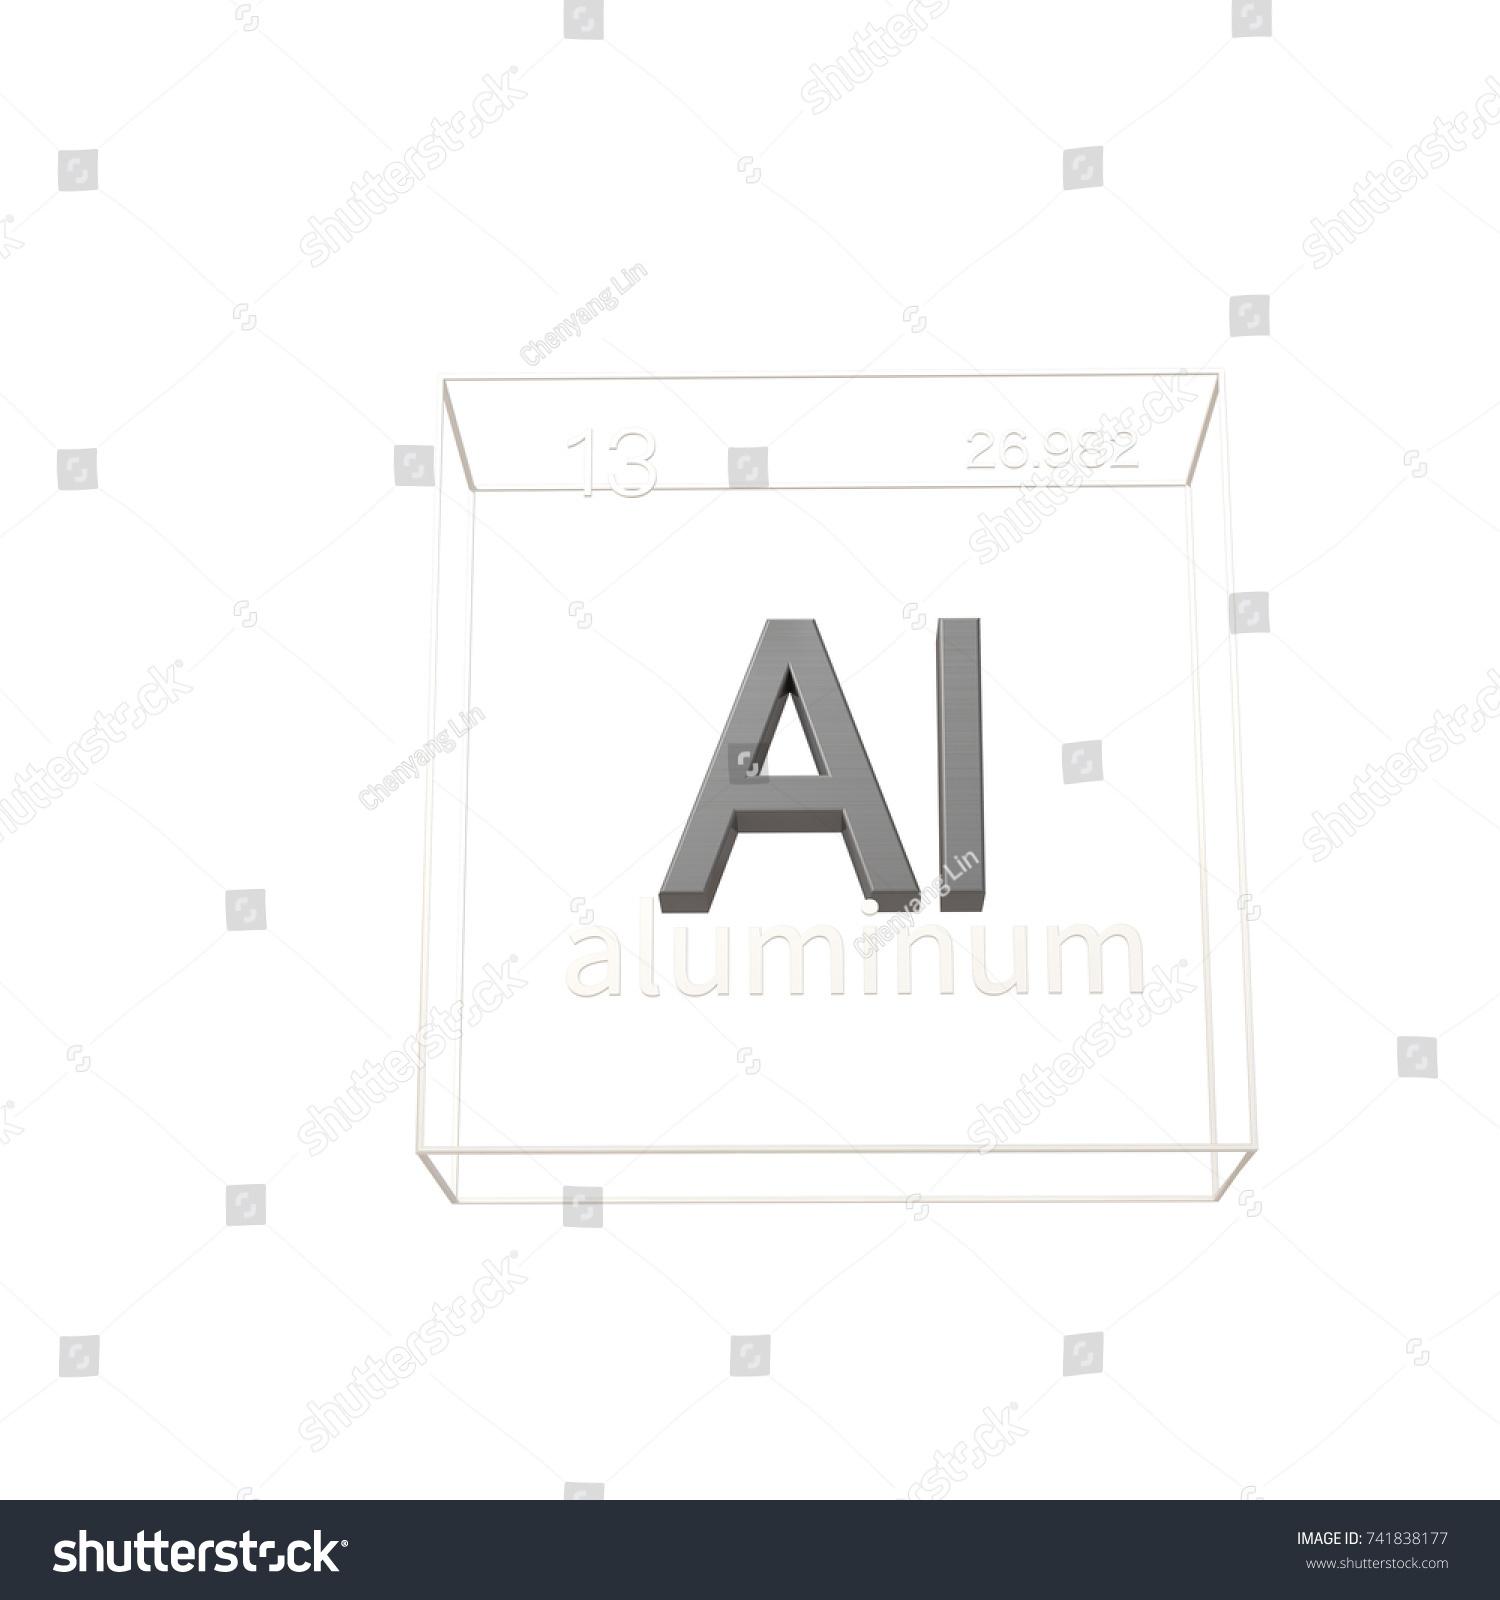 Aluminum Chemical Element Atomic Number Atomic Stock Illustration